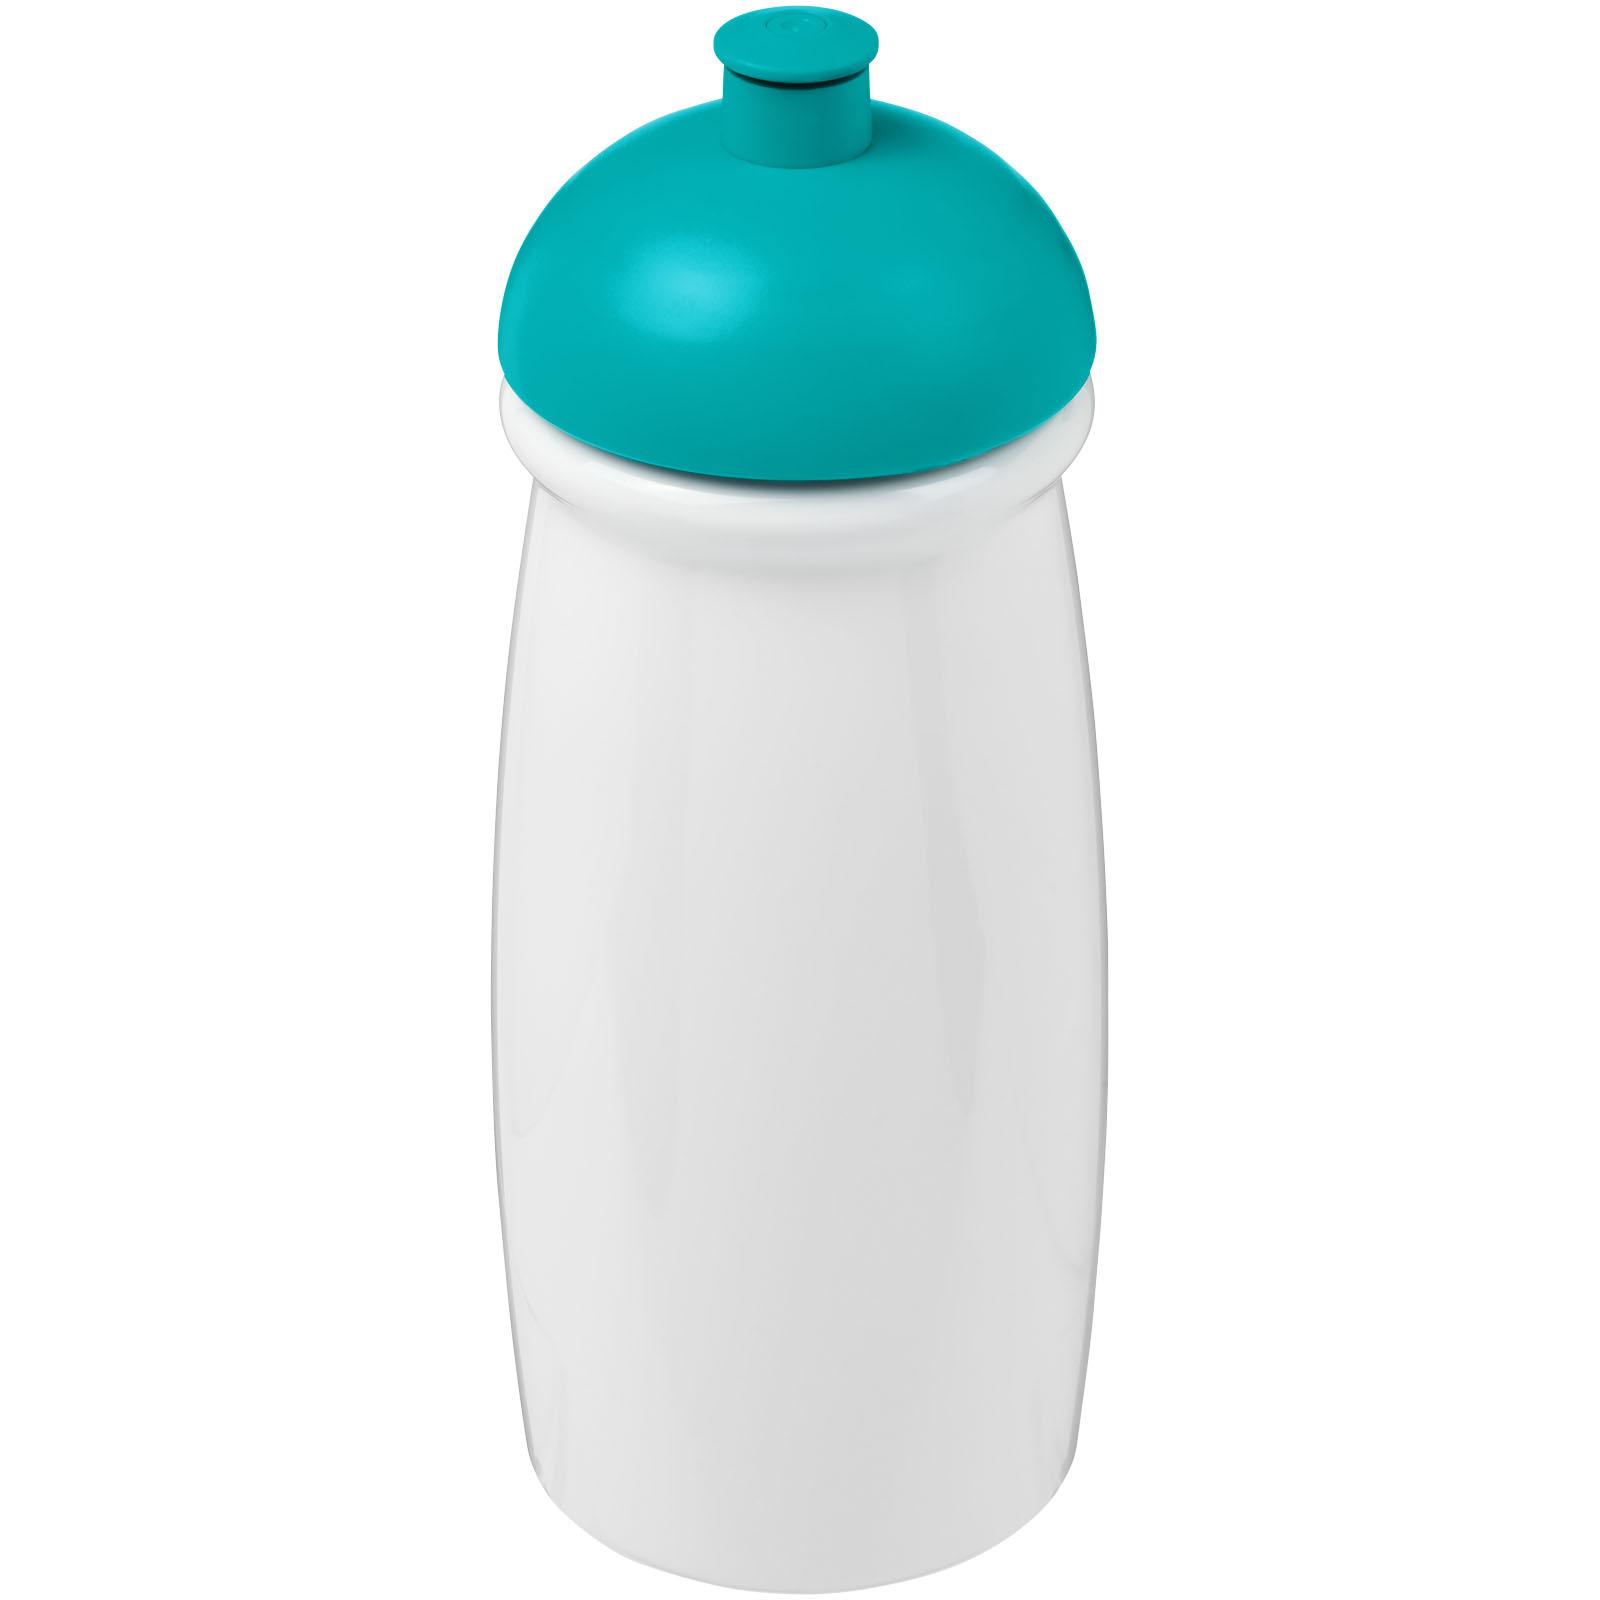 Big squeeze sport bottle, customization options